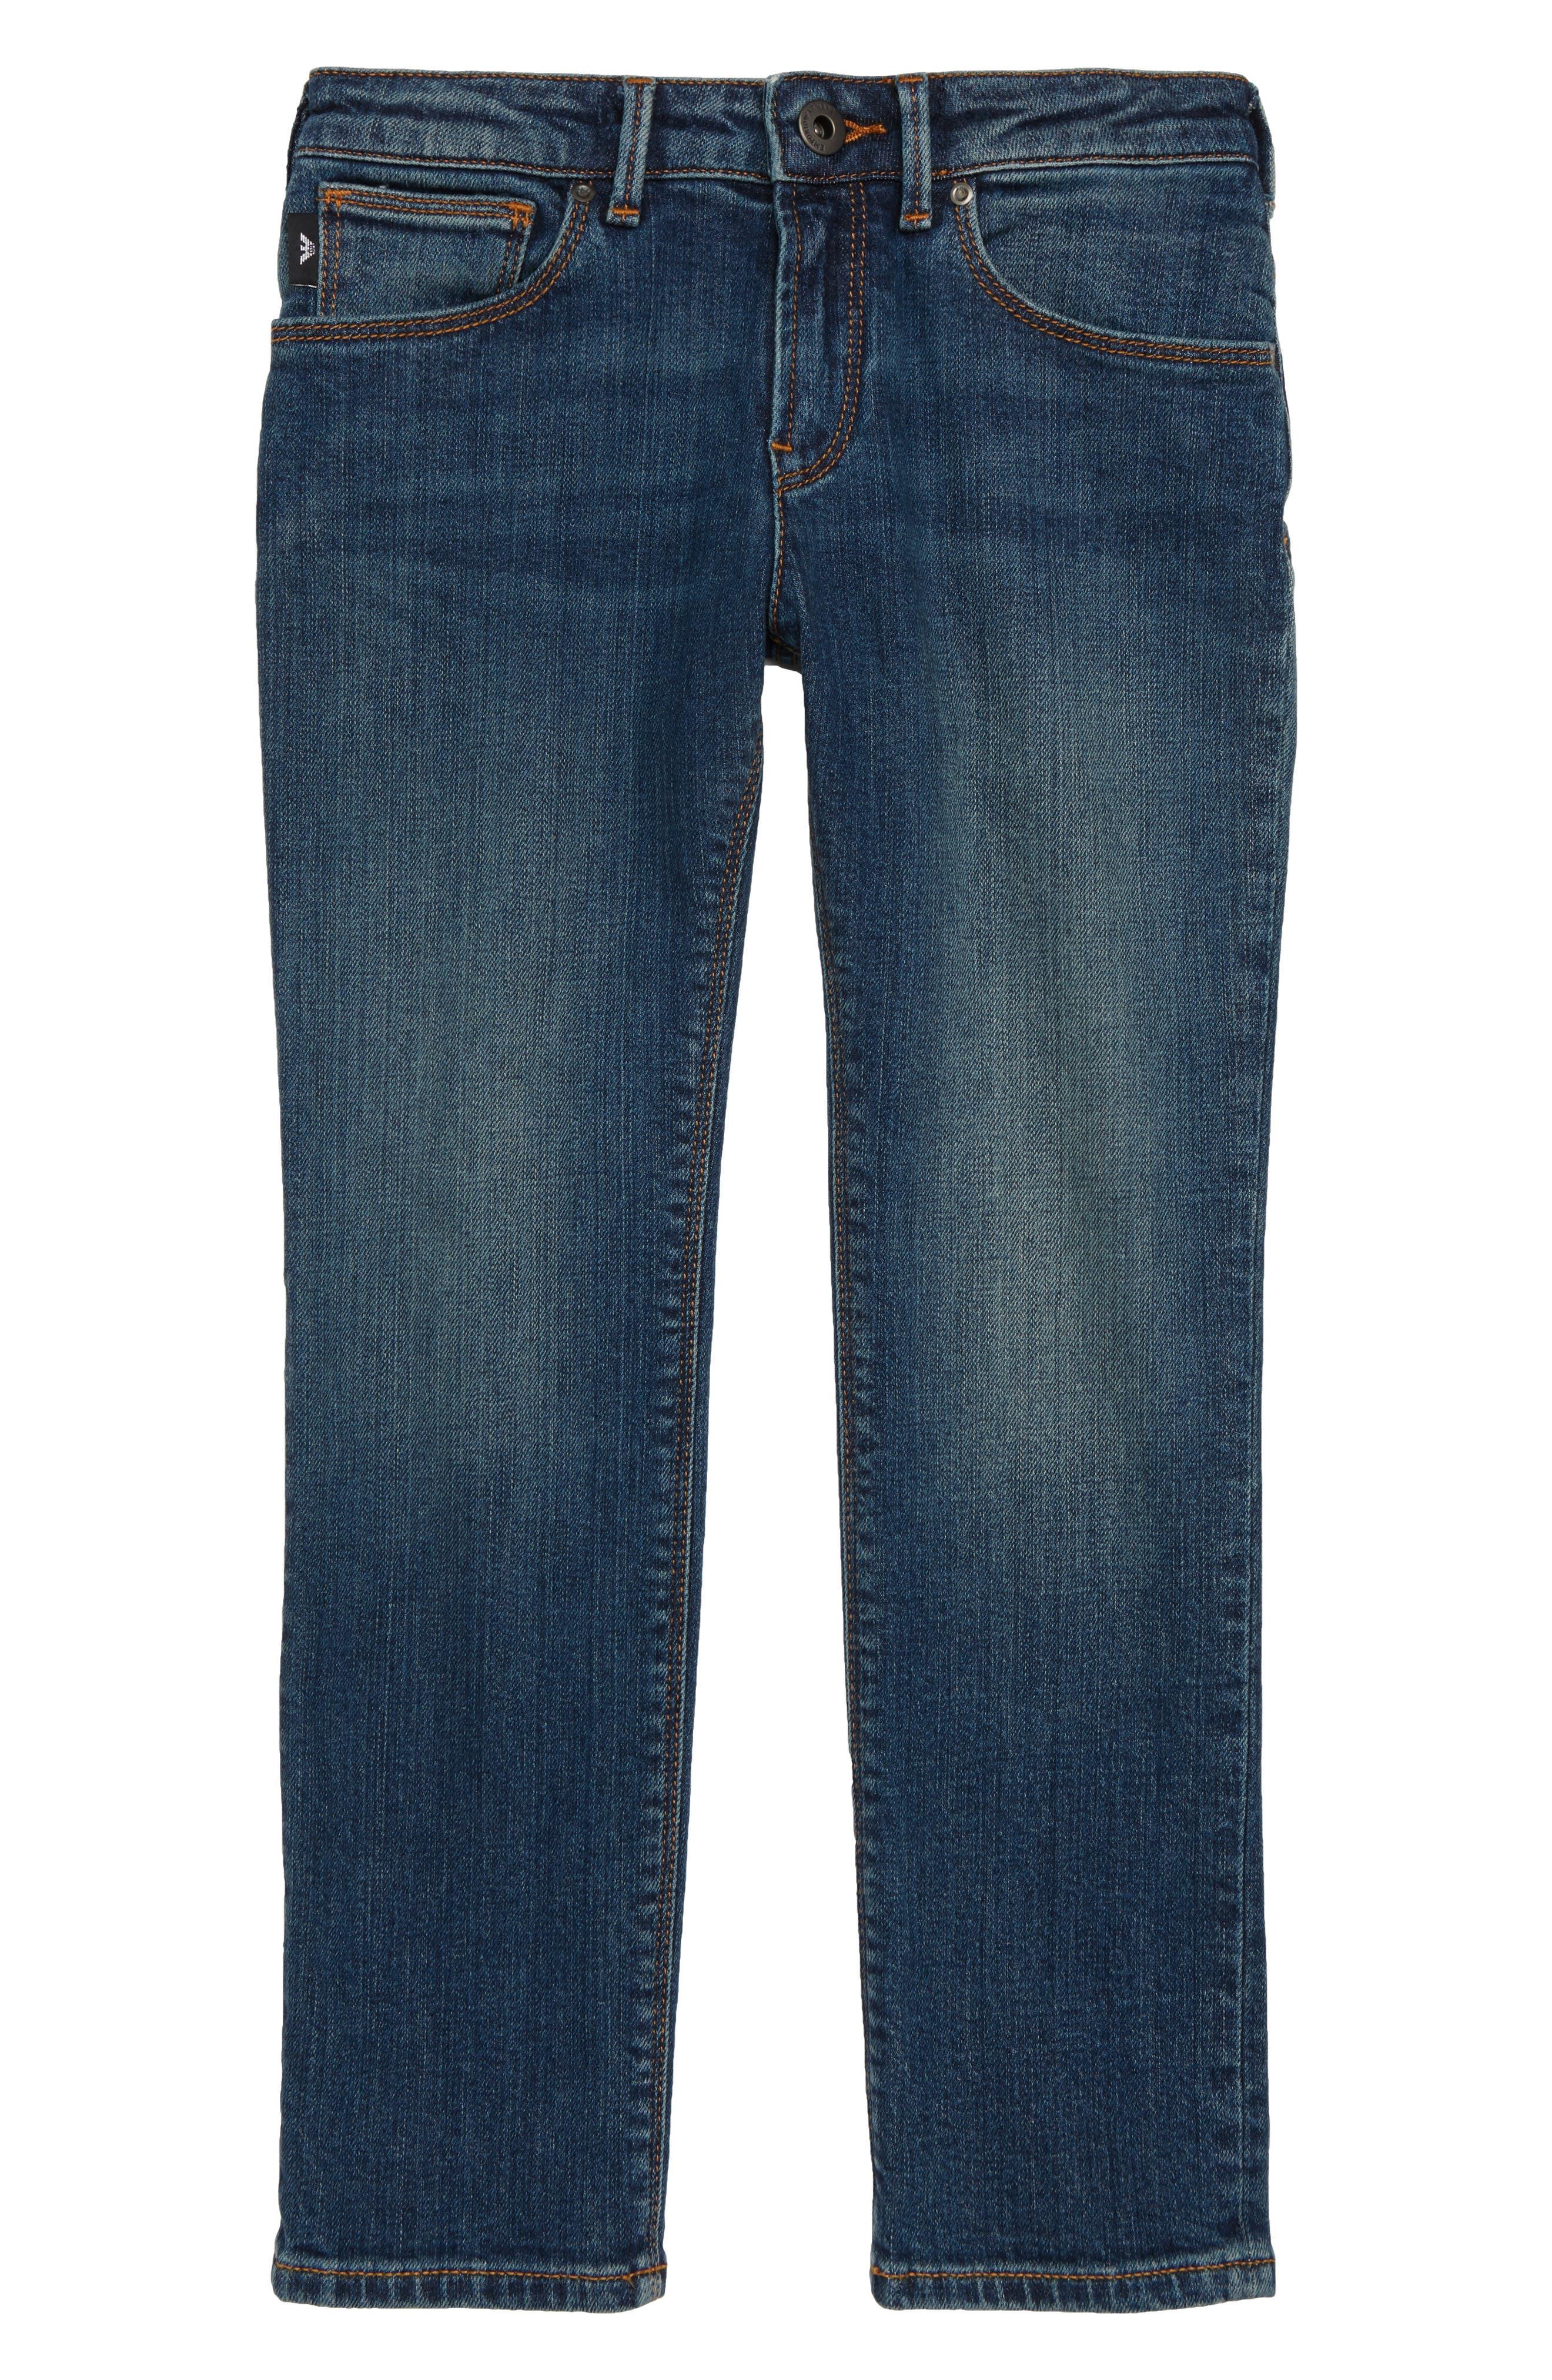 ARMANI JUNIOR,                             Denim Jeans,                             Main thumbnail 1, color,                             SOLID DARK BLUE